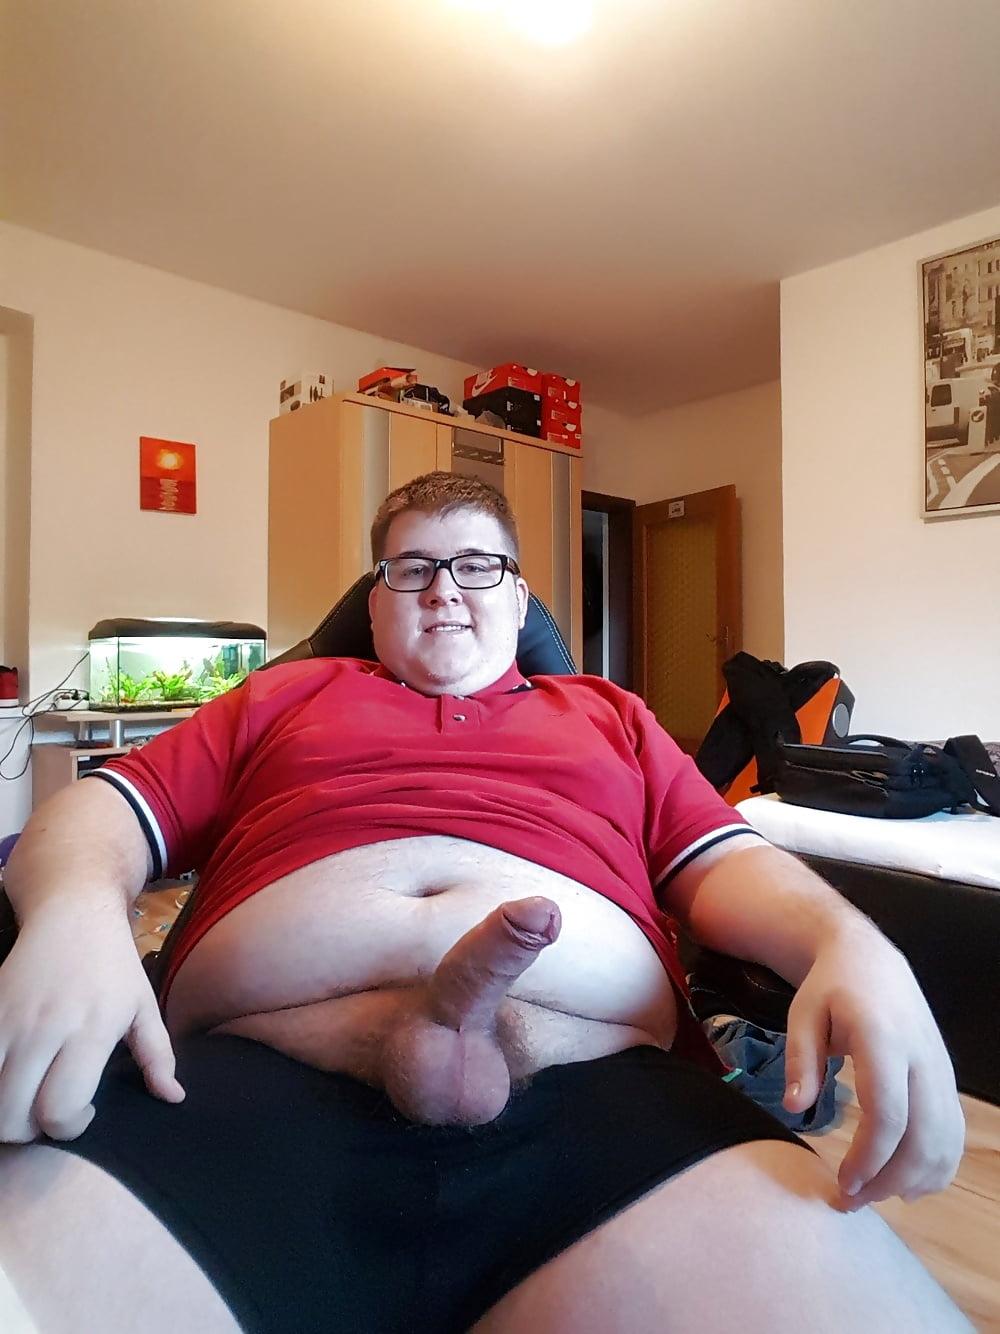 free-gay-chubby-boys-pics